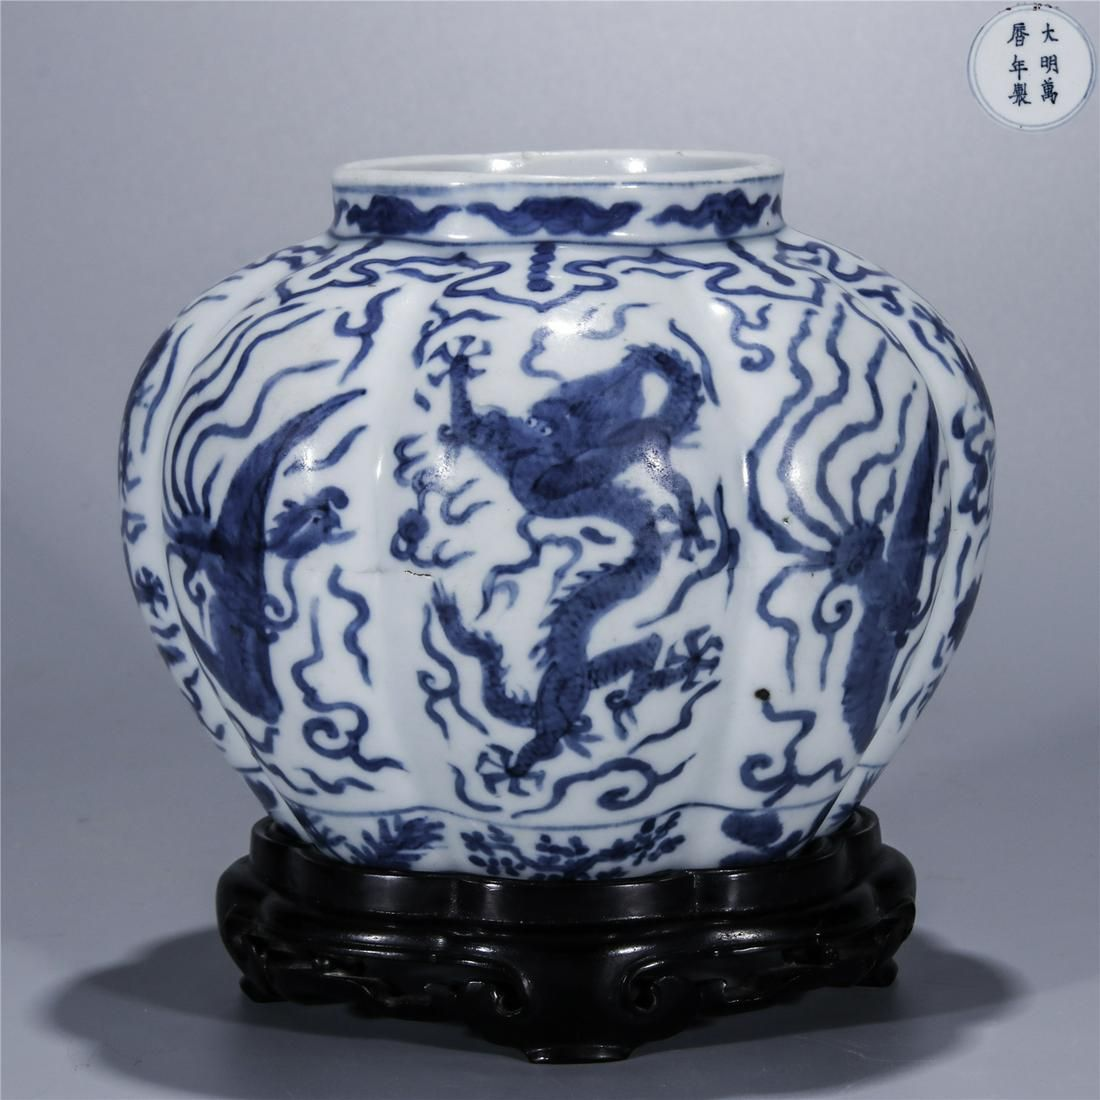 Blue and white dragon pheonix drawing porcelain jar